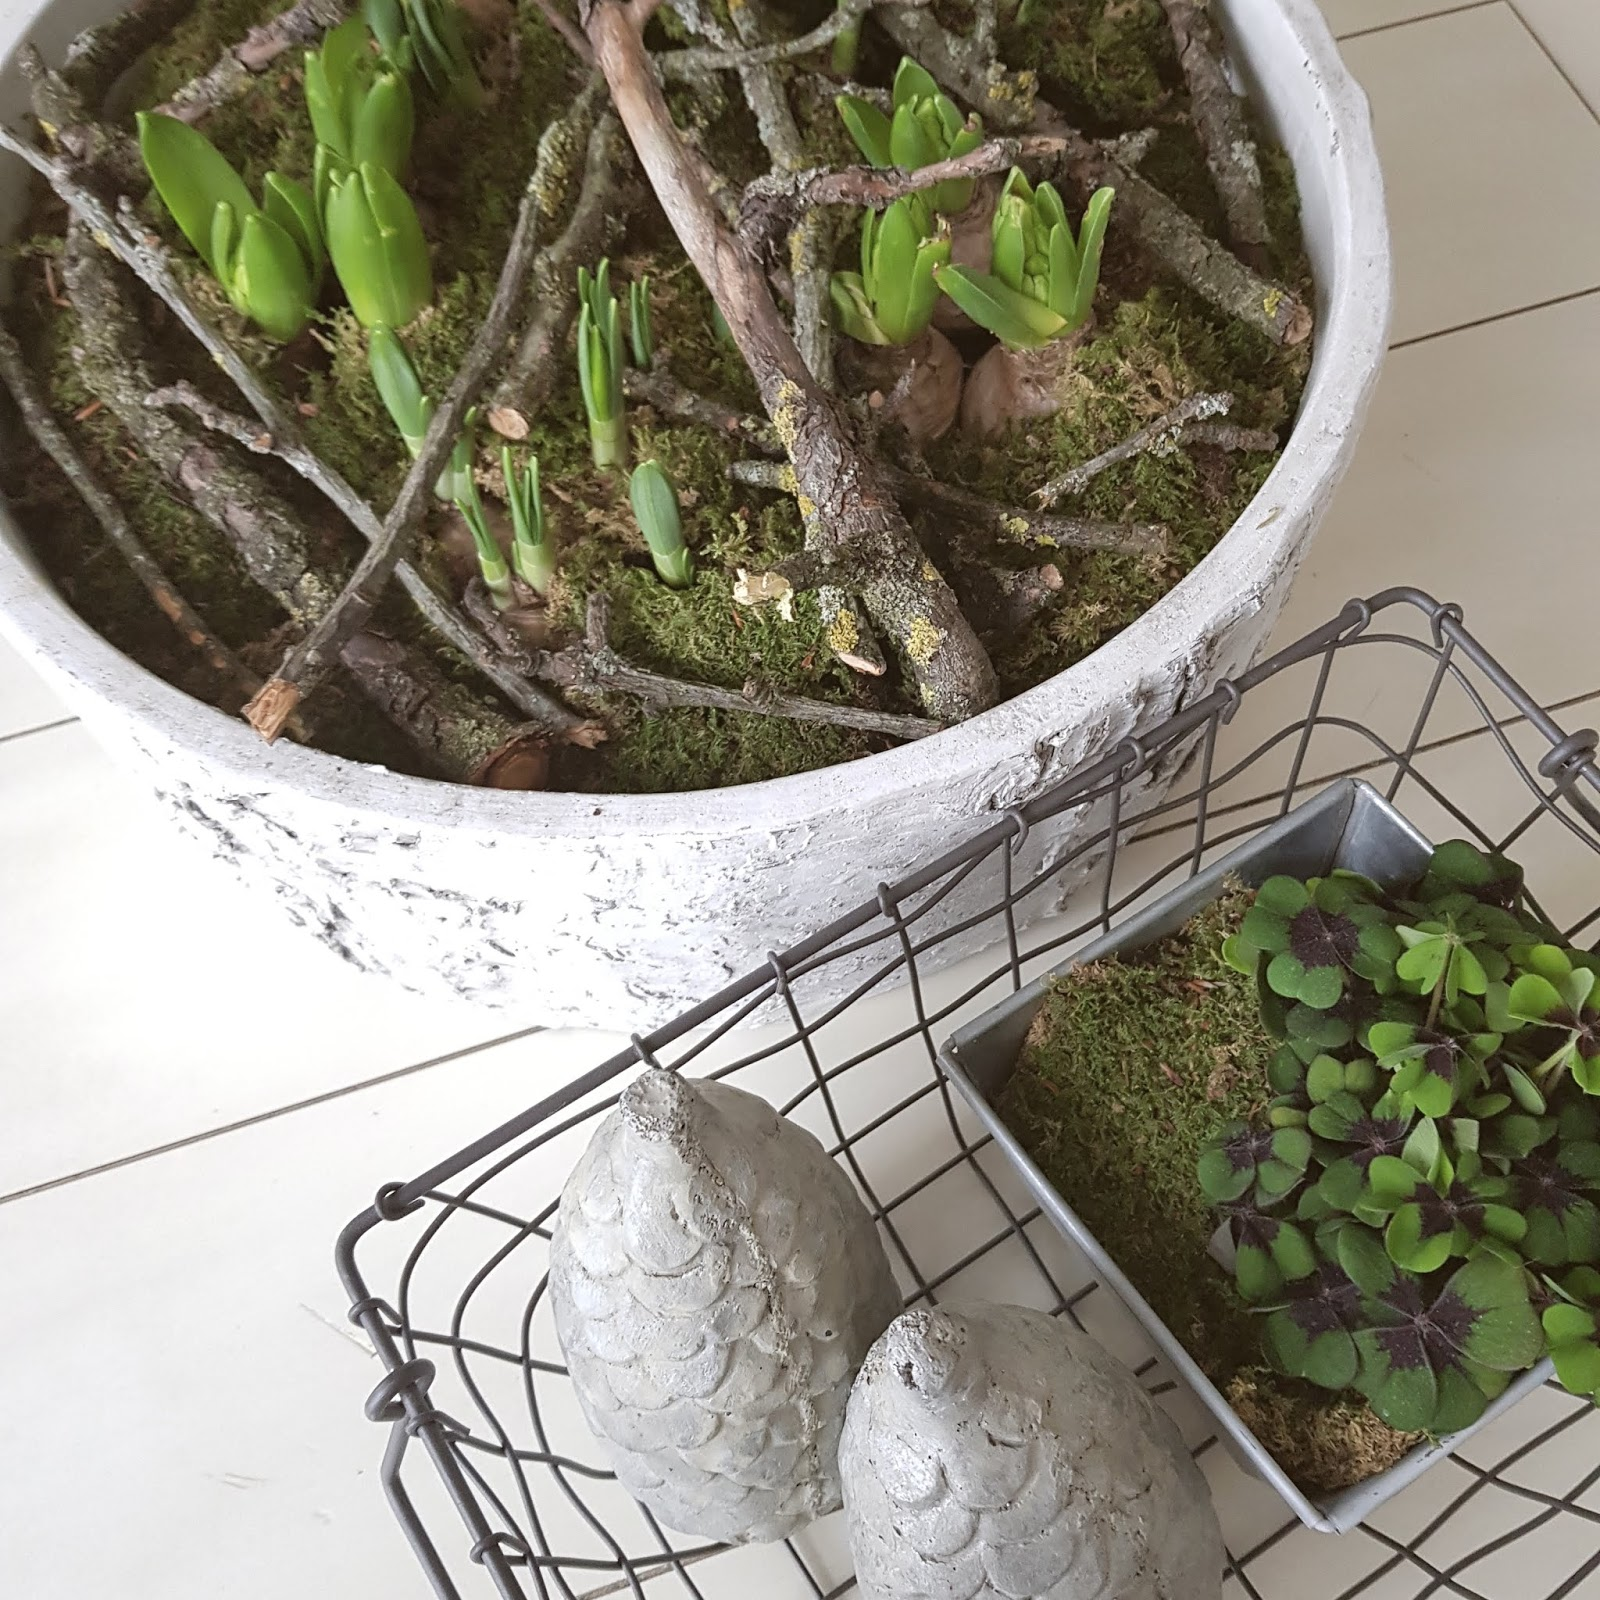 Frühlingsdeko mit Frühlingsblühern Moos und Ästen